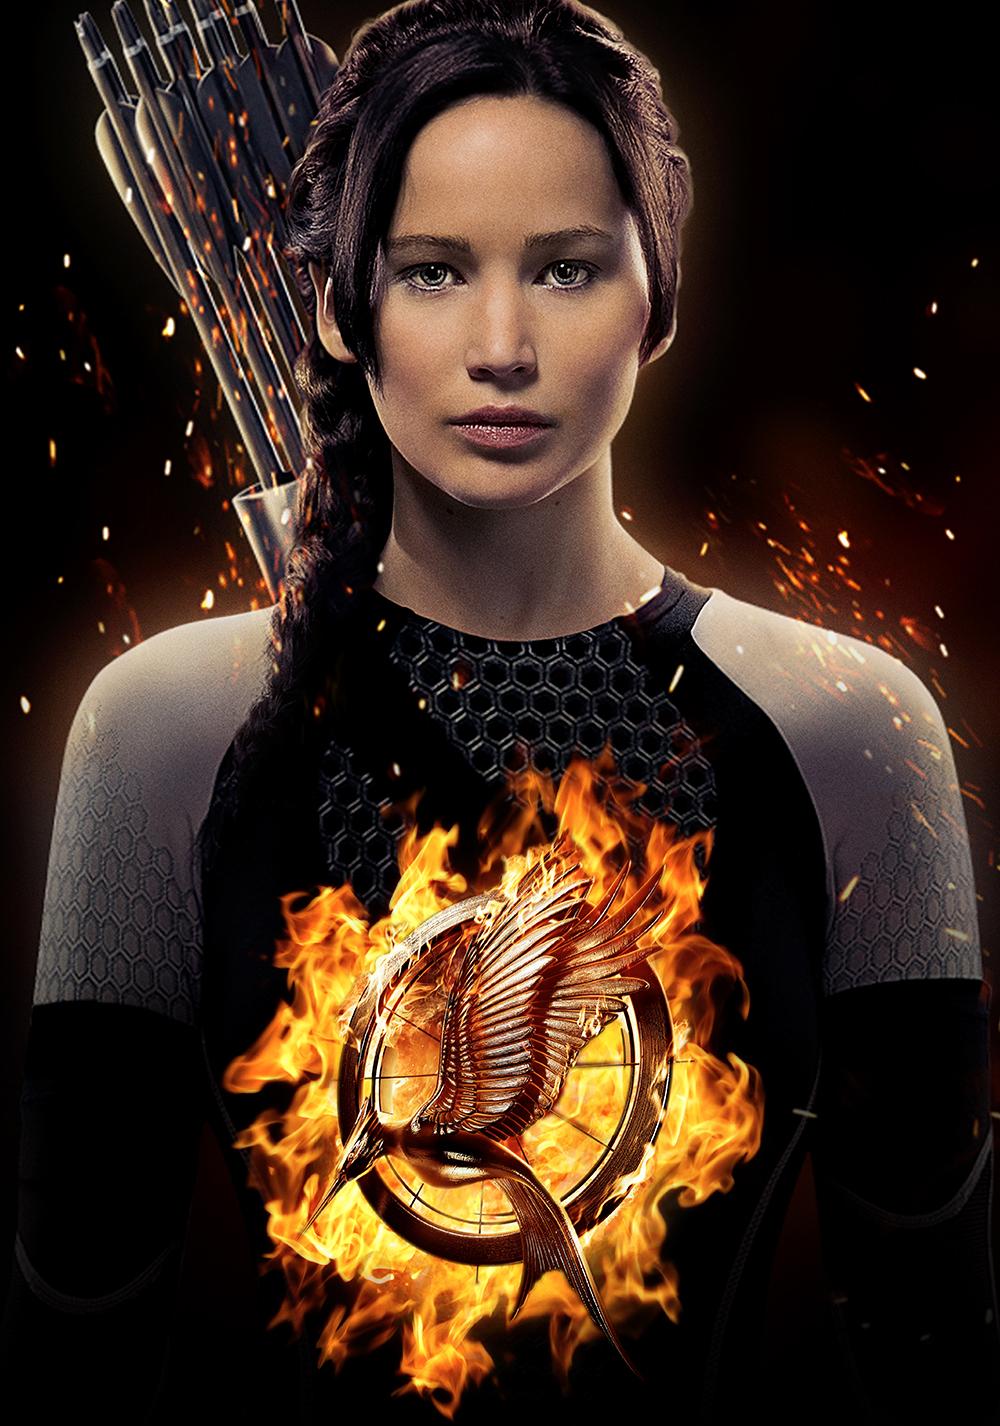 The Hunger Games: Catching Fire | Movie fanart | fanart.tv